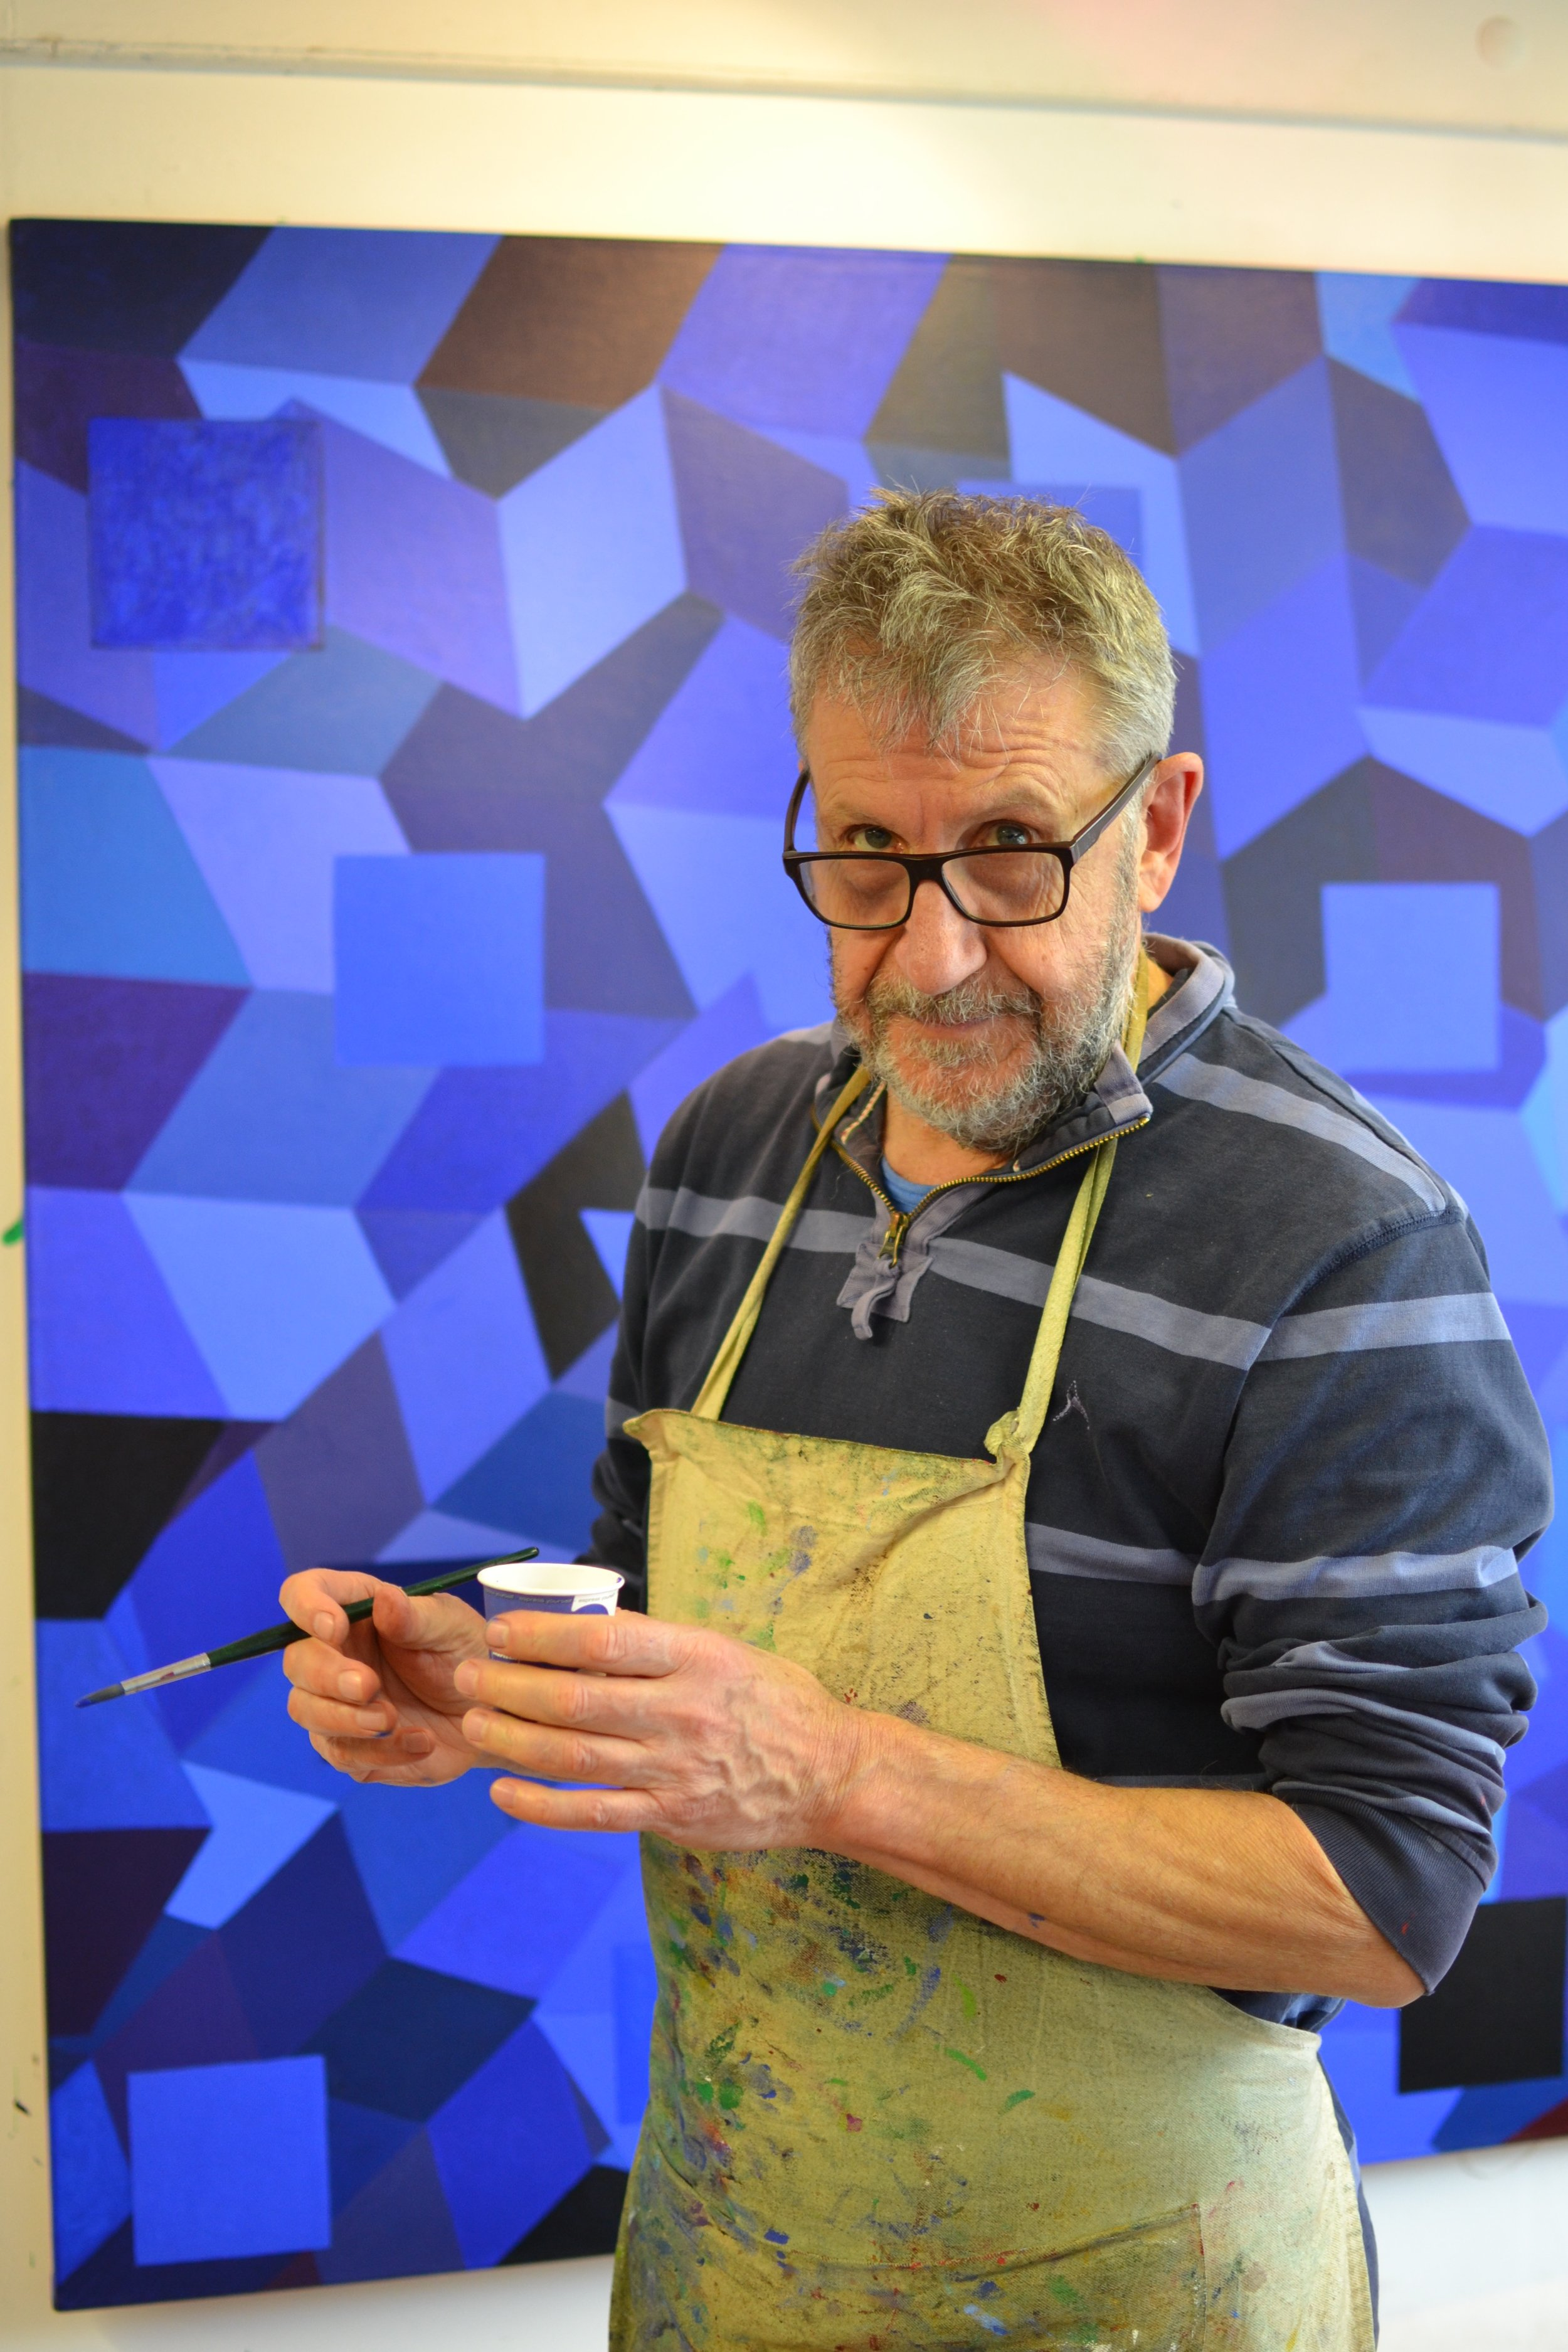 Clive Croft in his Waterloo studio.